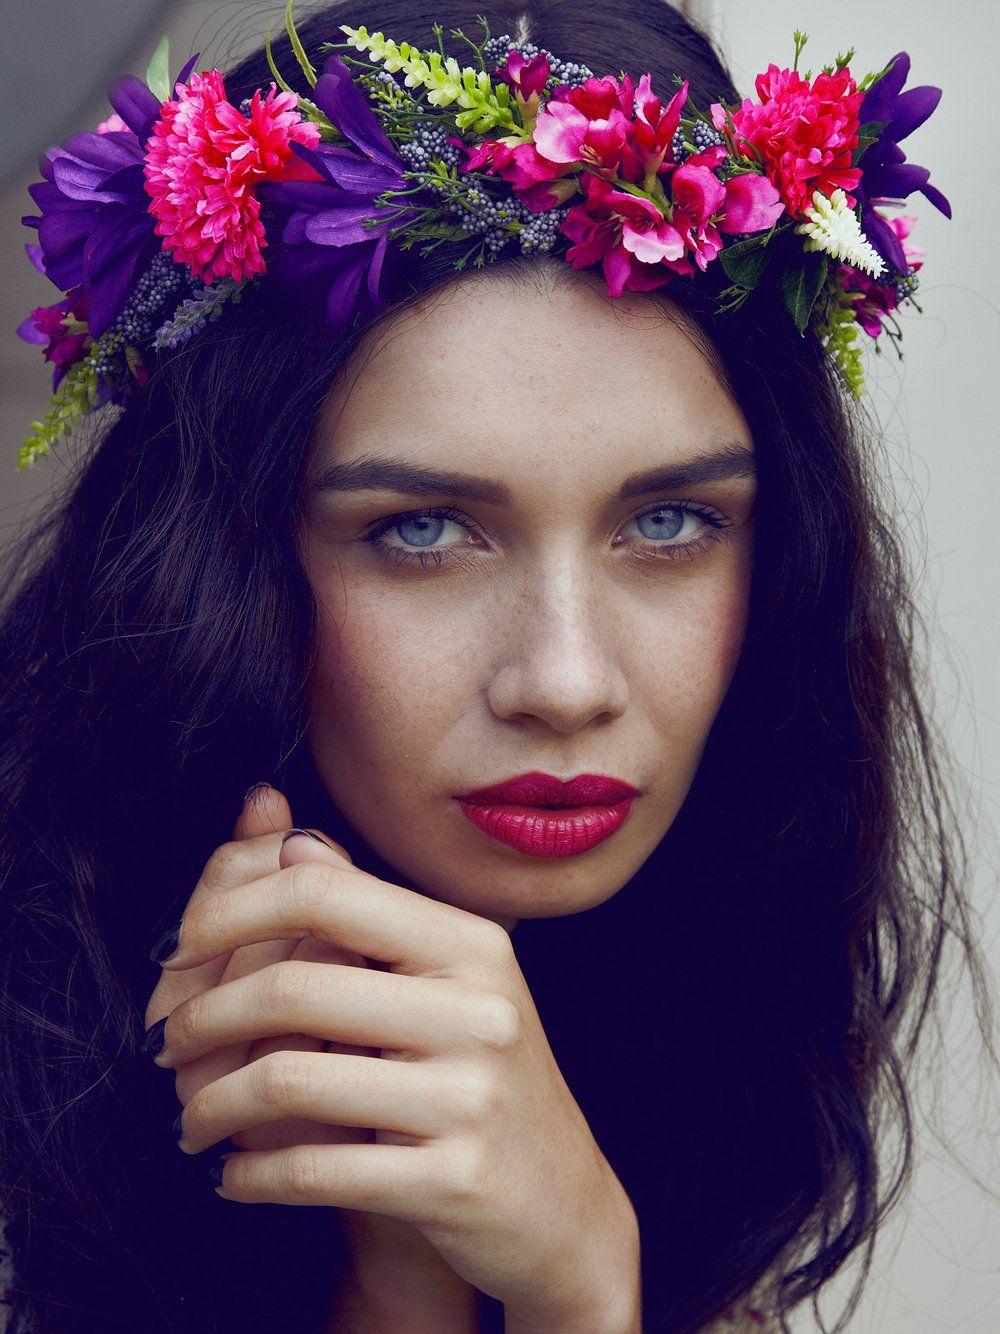 Hair accessories headbands uk - Clementine Floral Crown Garland Headband Rock N Rose From Rock N Rose Uk